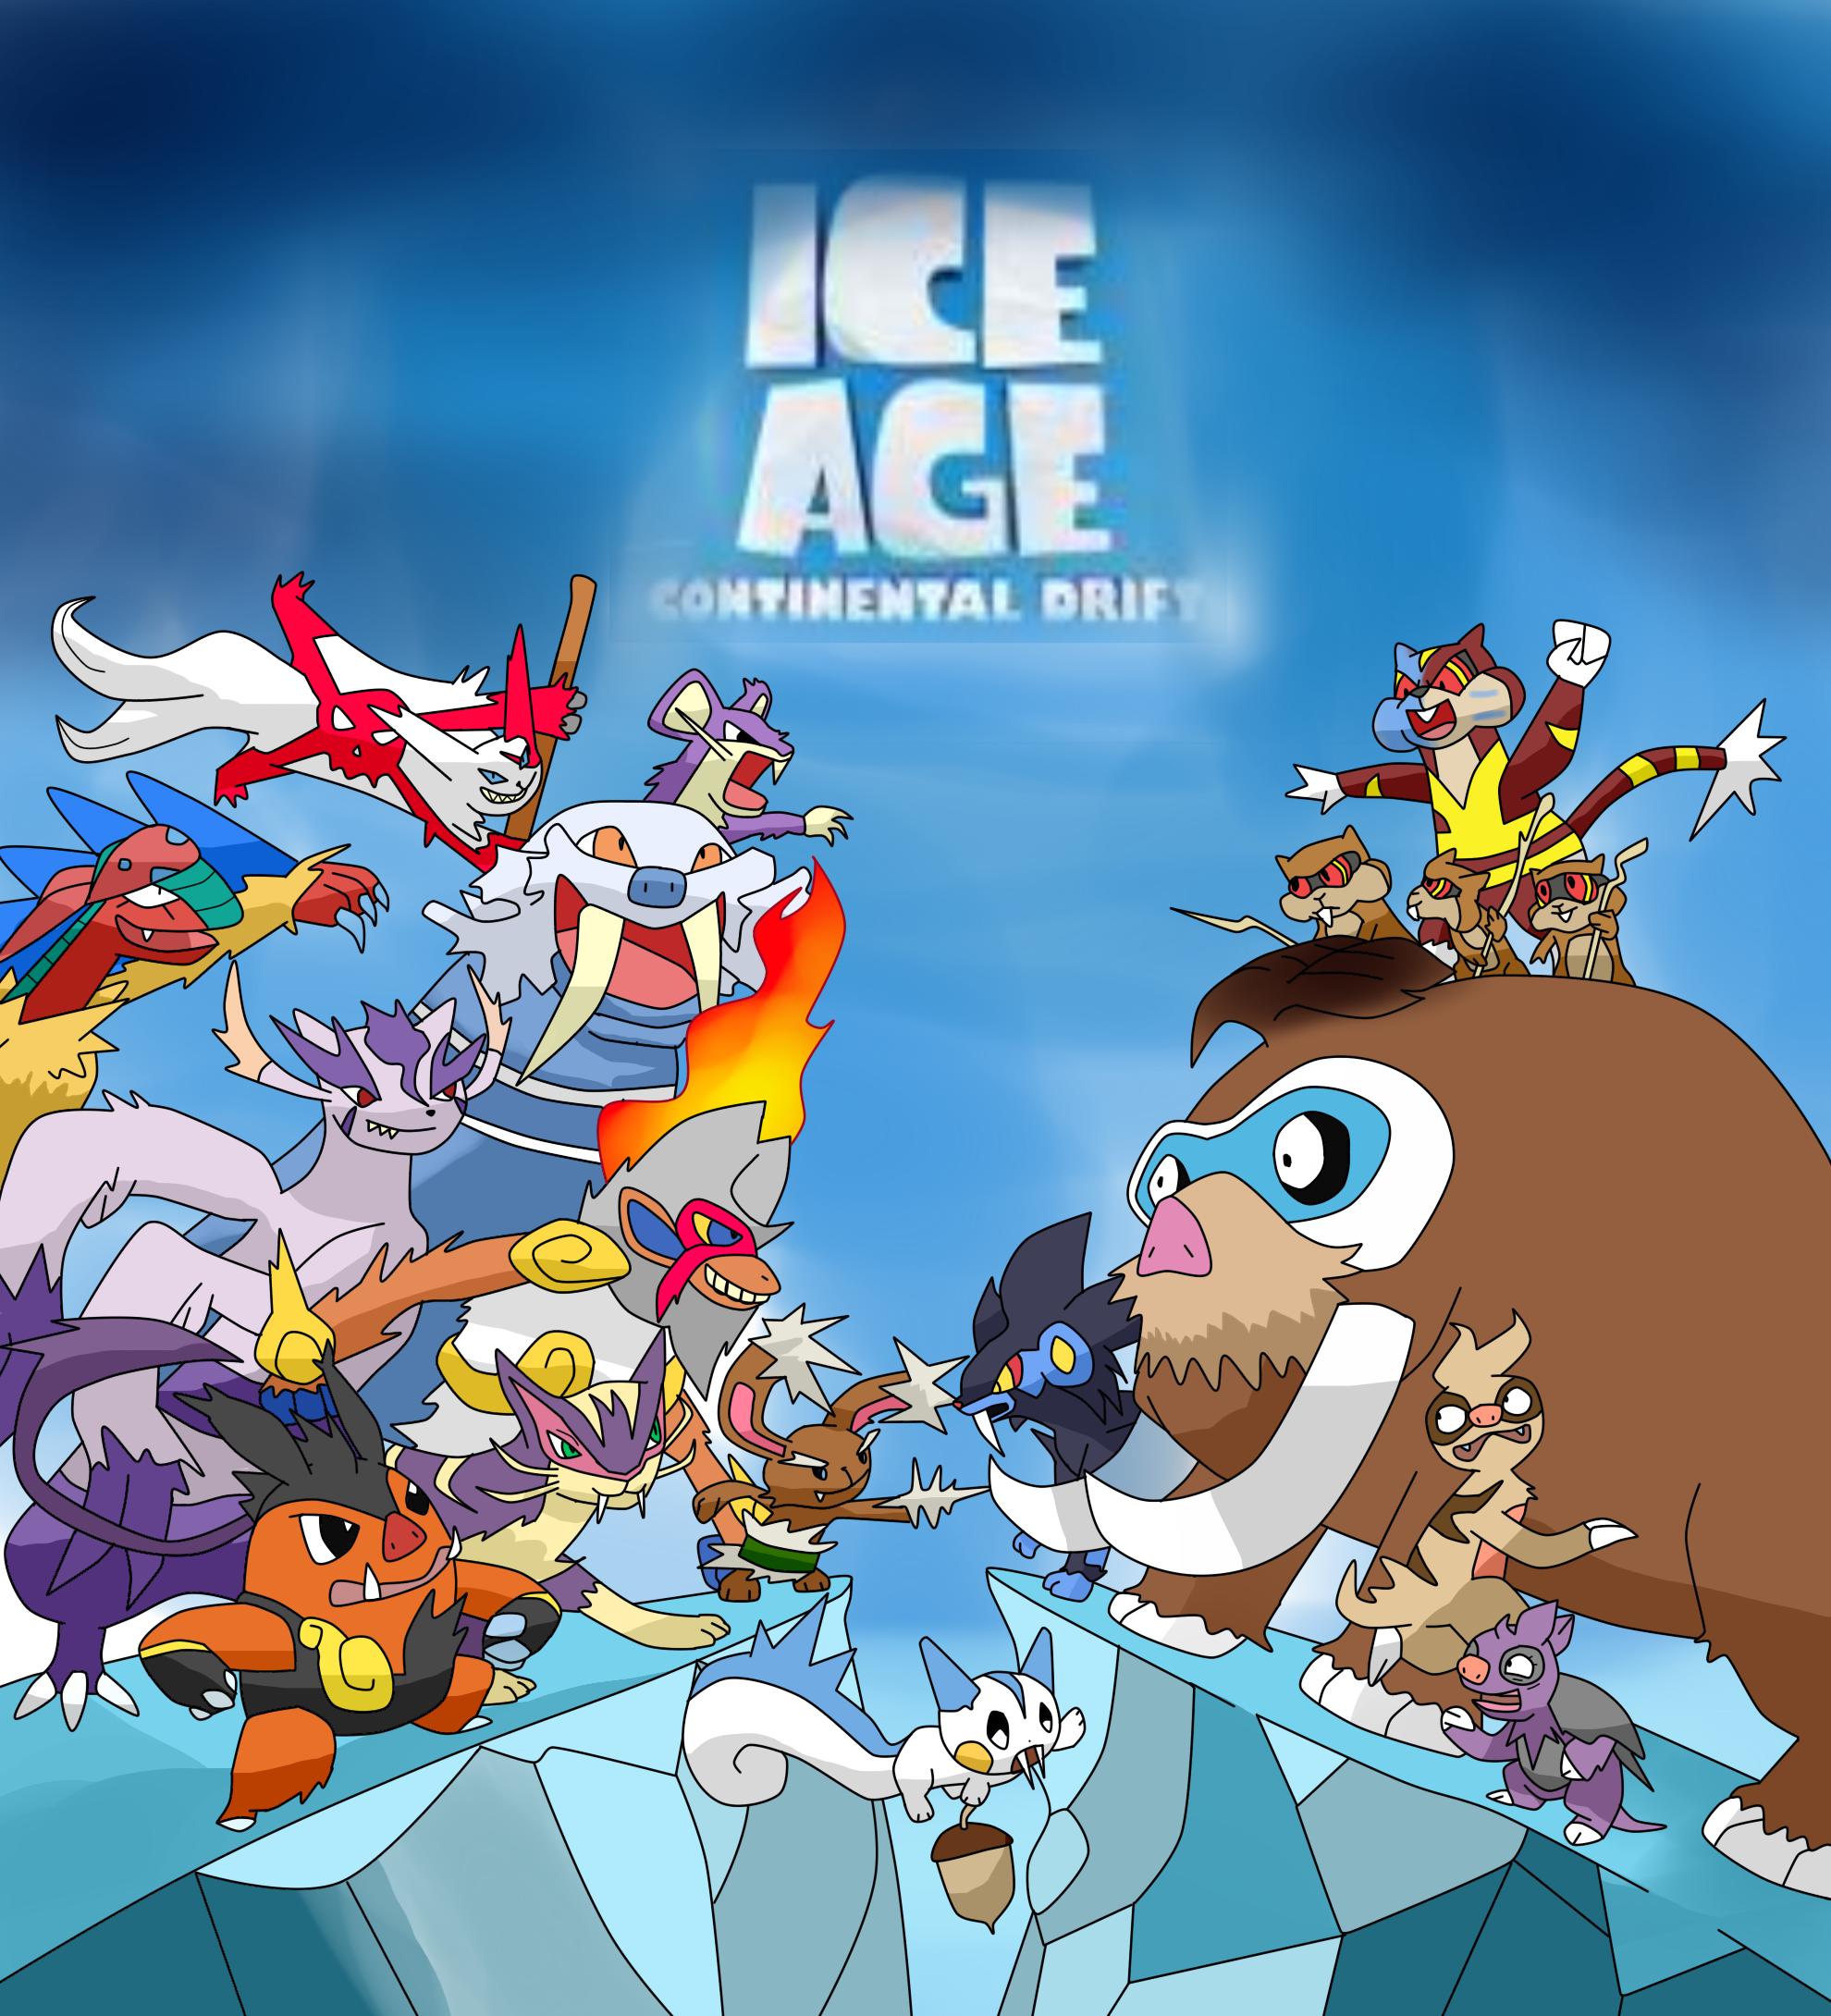 http://fc06.deviantart.net/fs70/f/2013/157/3/0/ice_age_4__pokemon_style_by_darkface13-d67zscs.png